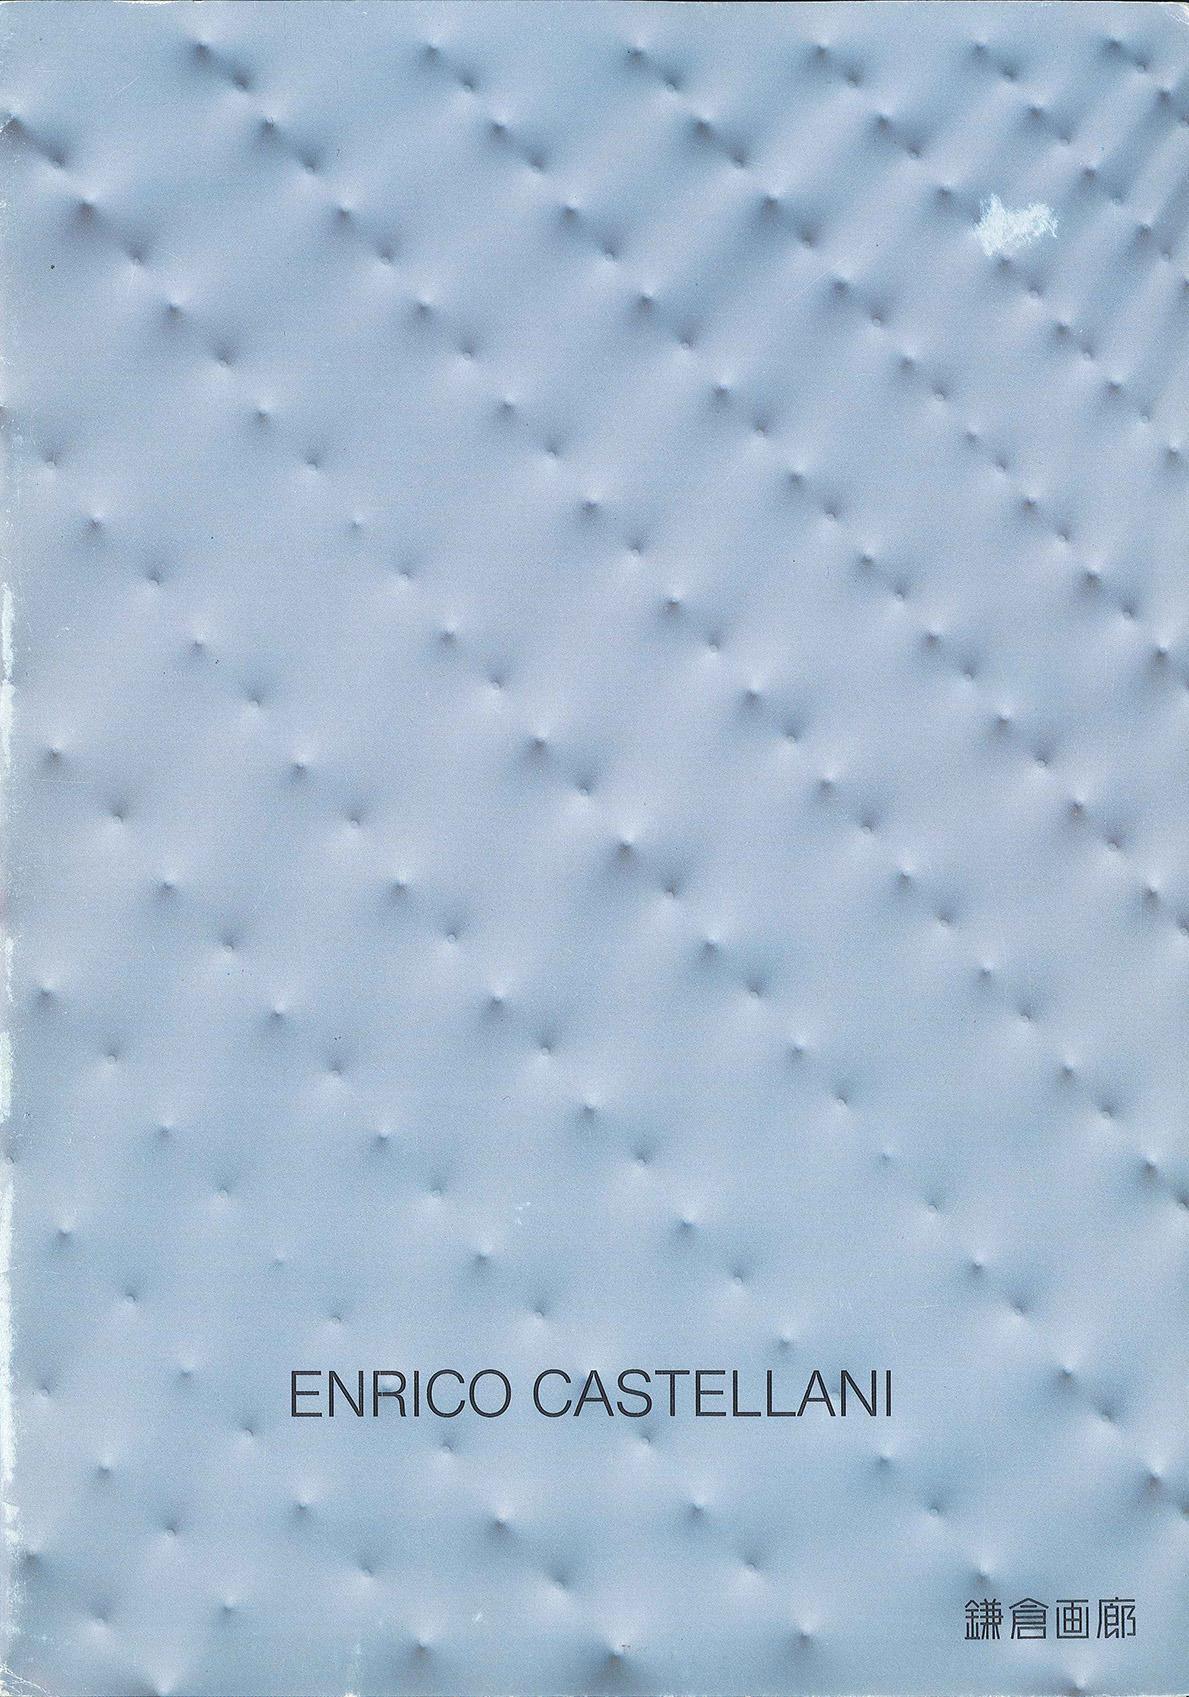 Cover - Enrico Castellani, Iseki Masaaki, 1991, Kamakura Gallery, Tokyo (JPN)